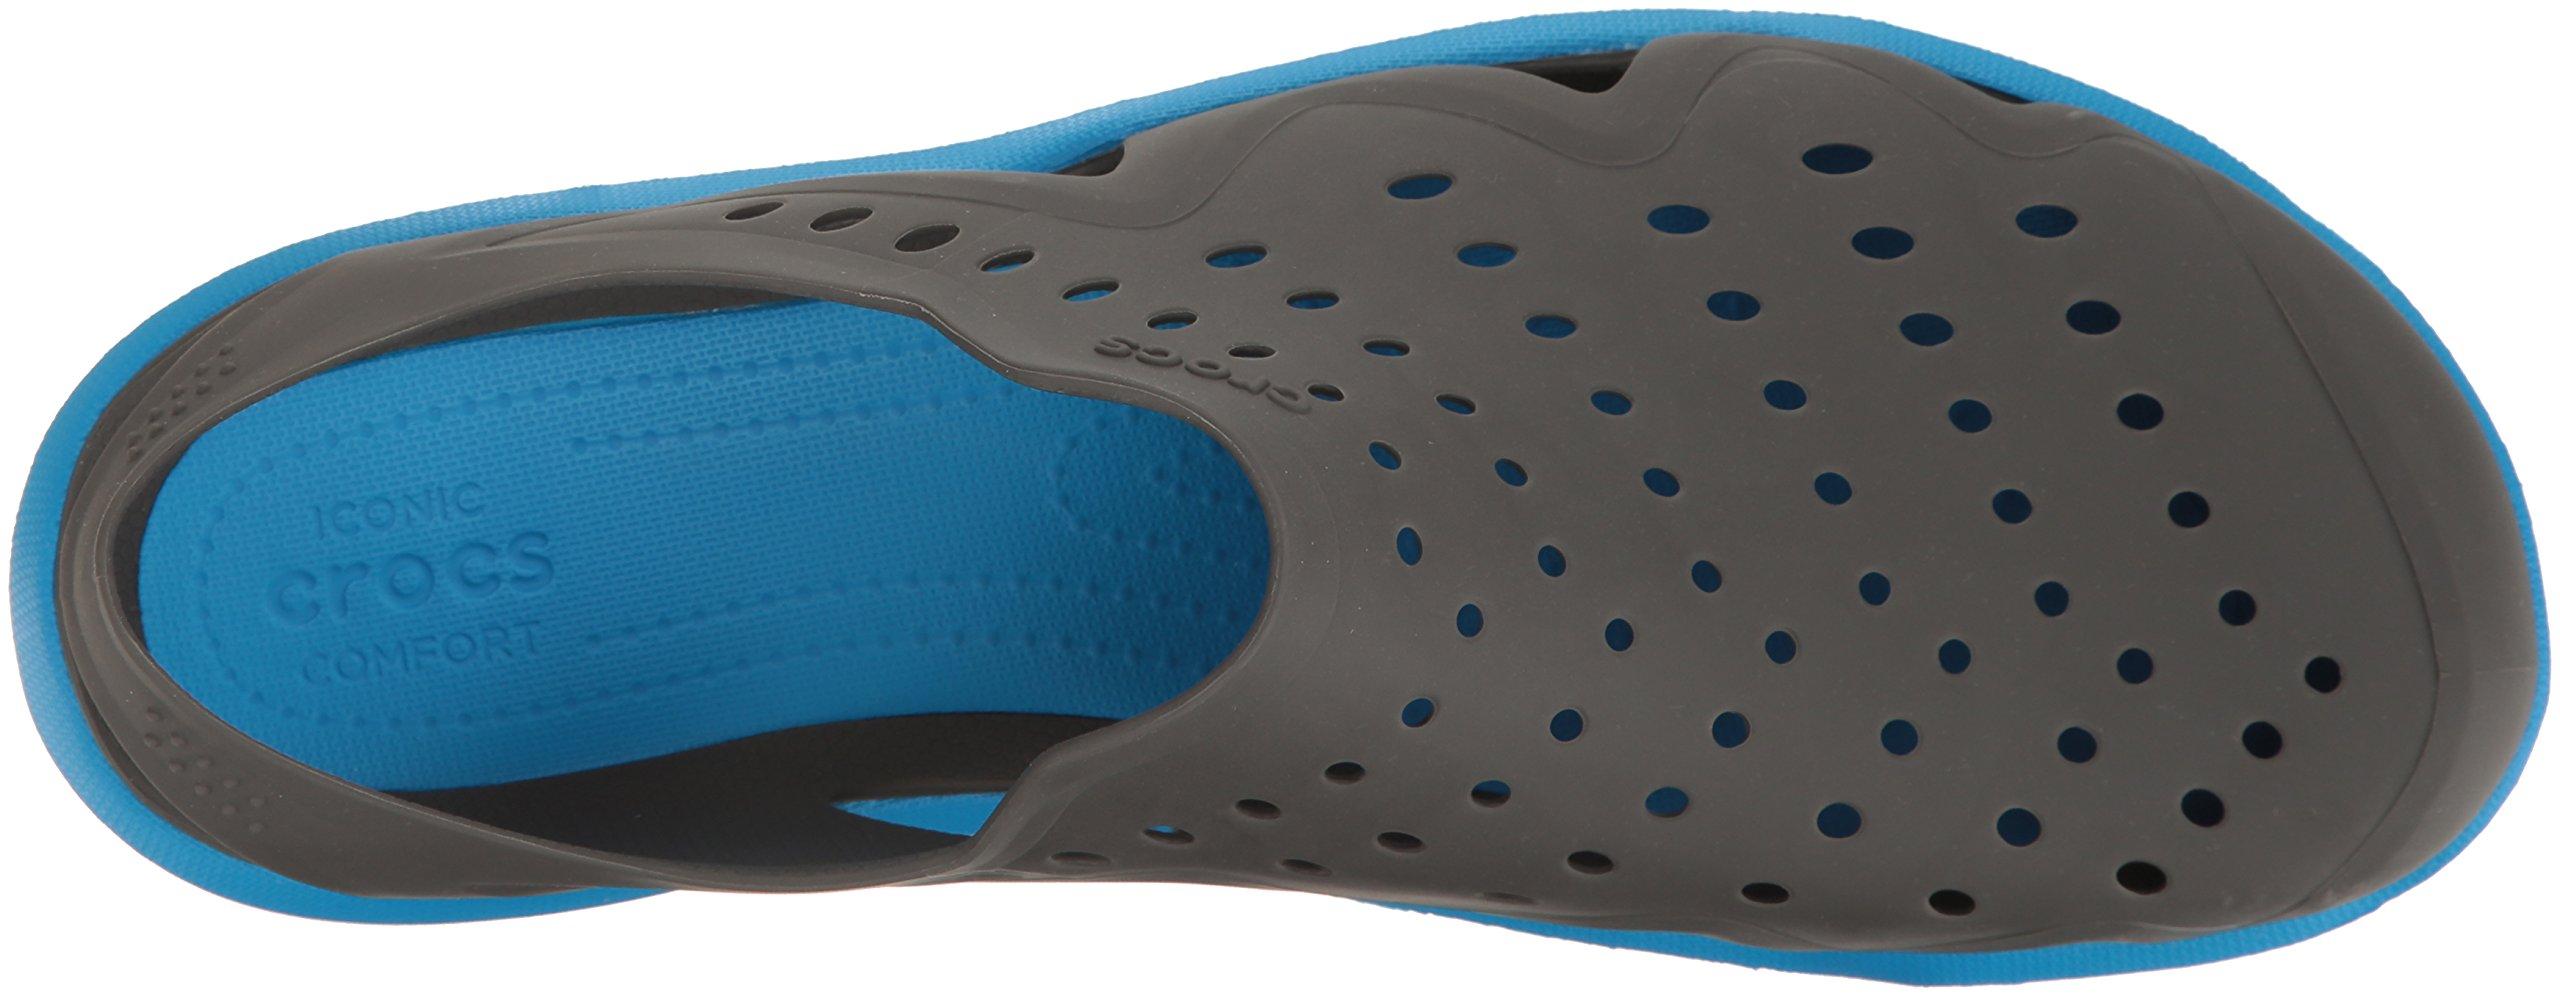 crocs Men's Swiftwater Wave M Flat,Graphite/Ocean,11 M US by Crocs (Image #9)